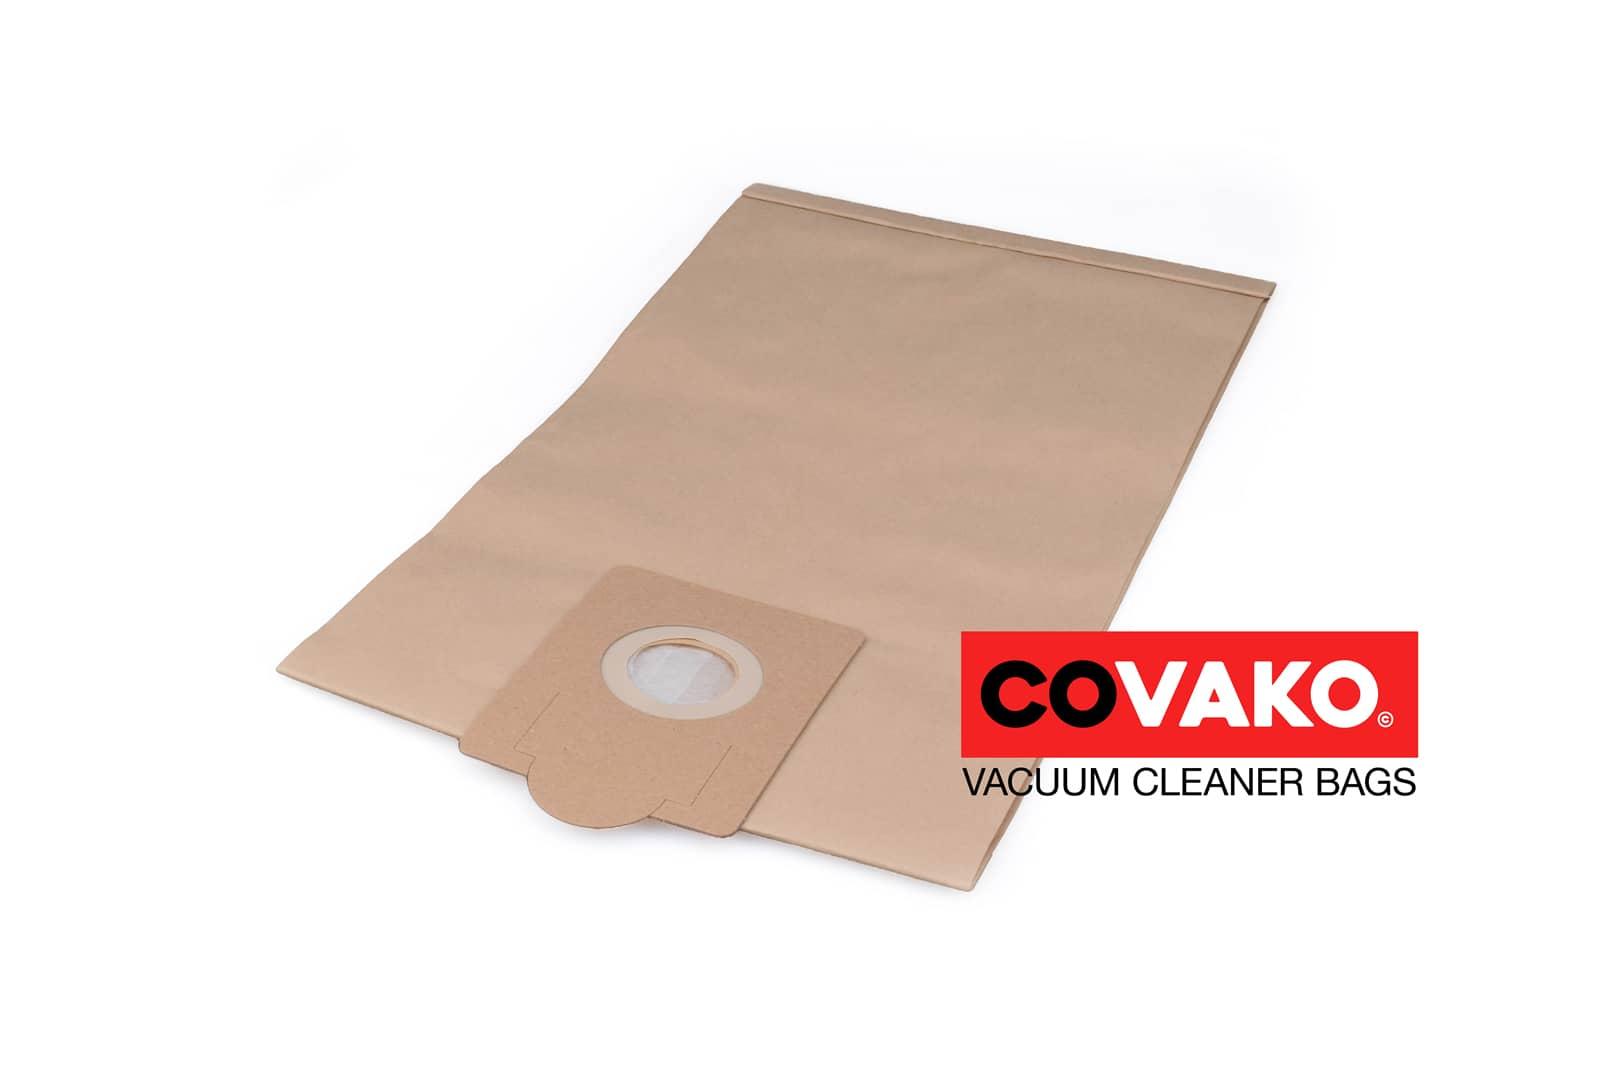 Eurom Force 1012 wet/dry / Papier - Eurom sacs d'aspirateur